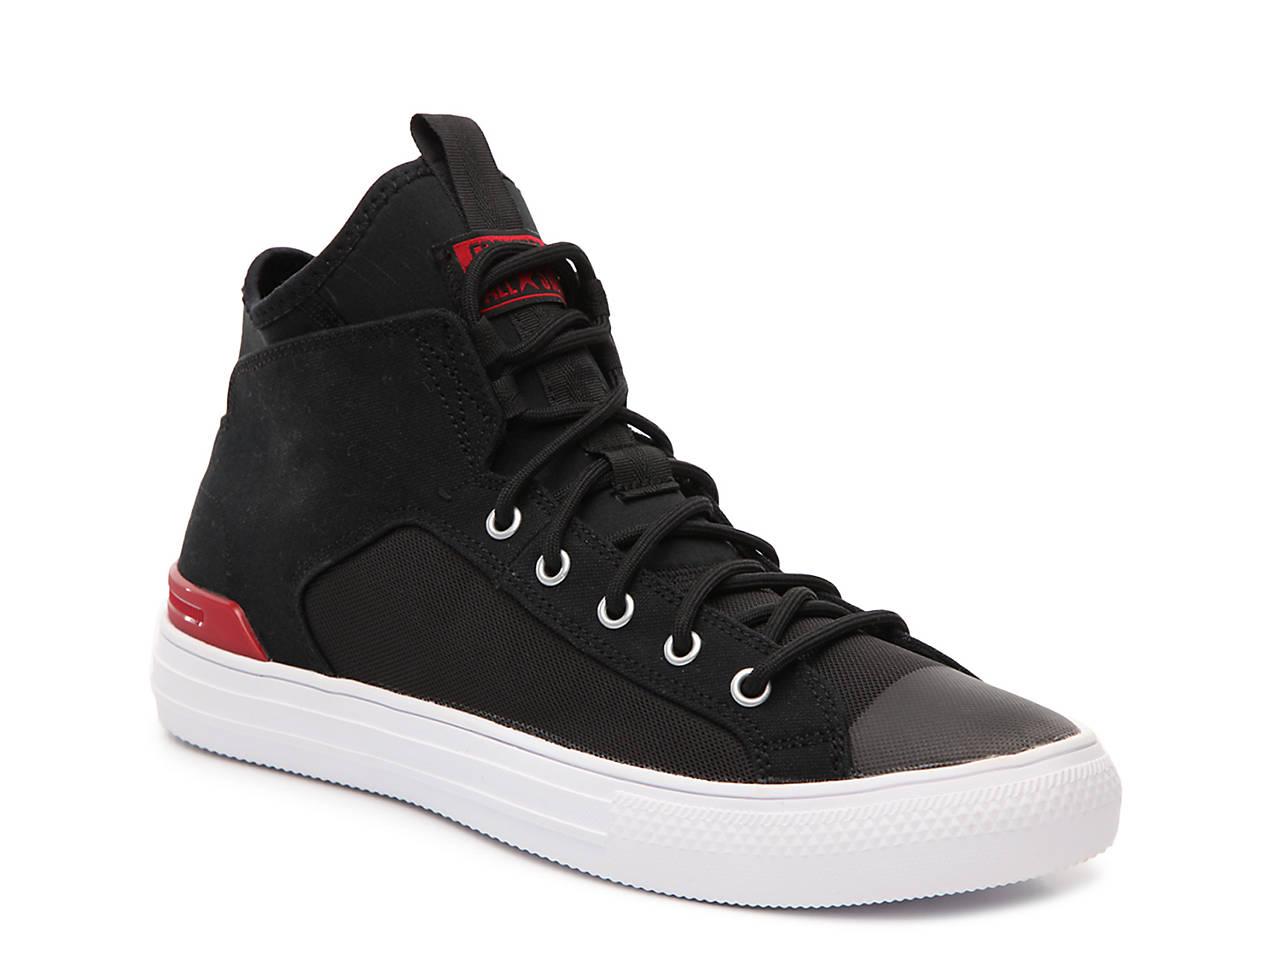 Converse Chuck Taylor All Star Ultra Lite High-Top Sneaker - Men s ... dbea56c00